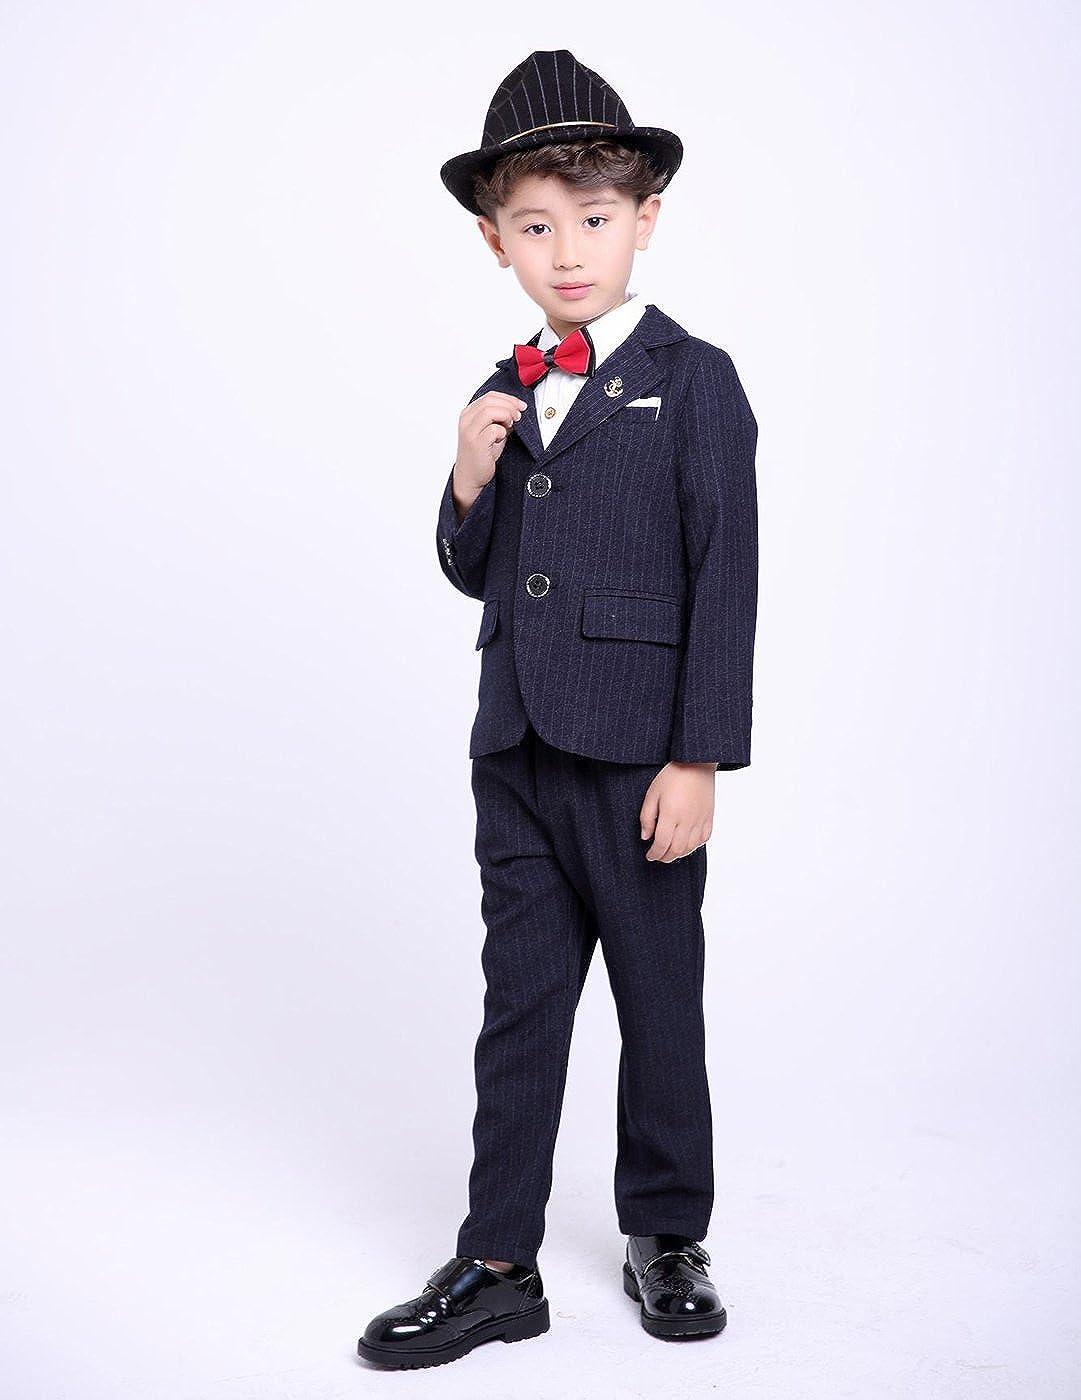 Amazon.com: fengchengjize Niños Pinstripe 3 Pcs traje formal ...